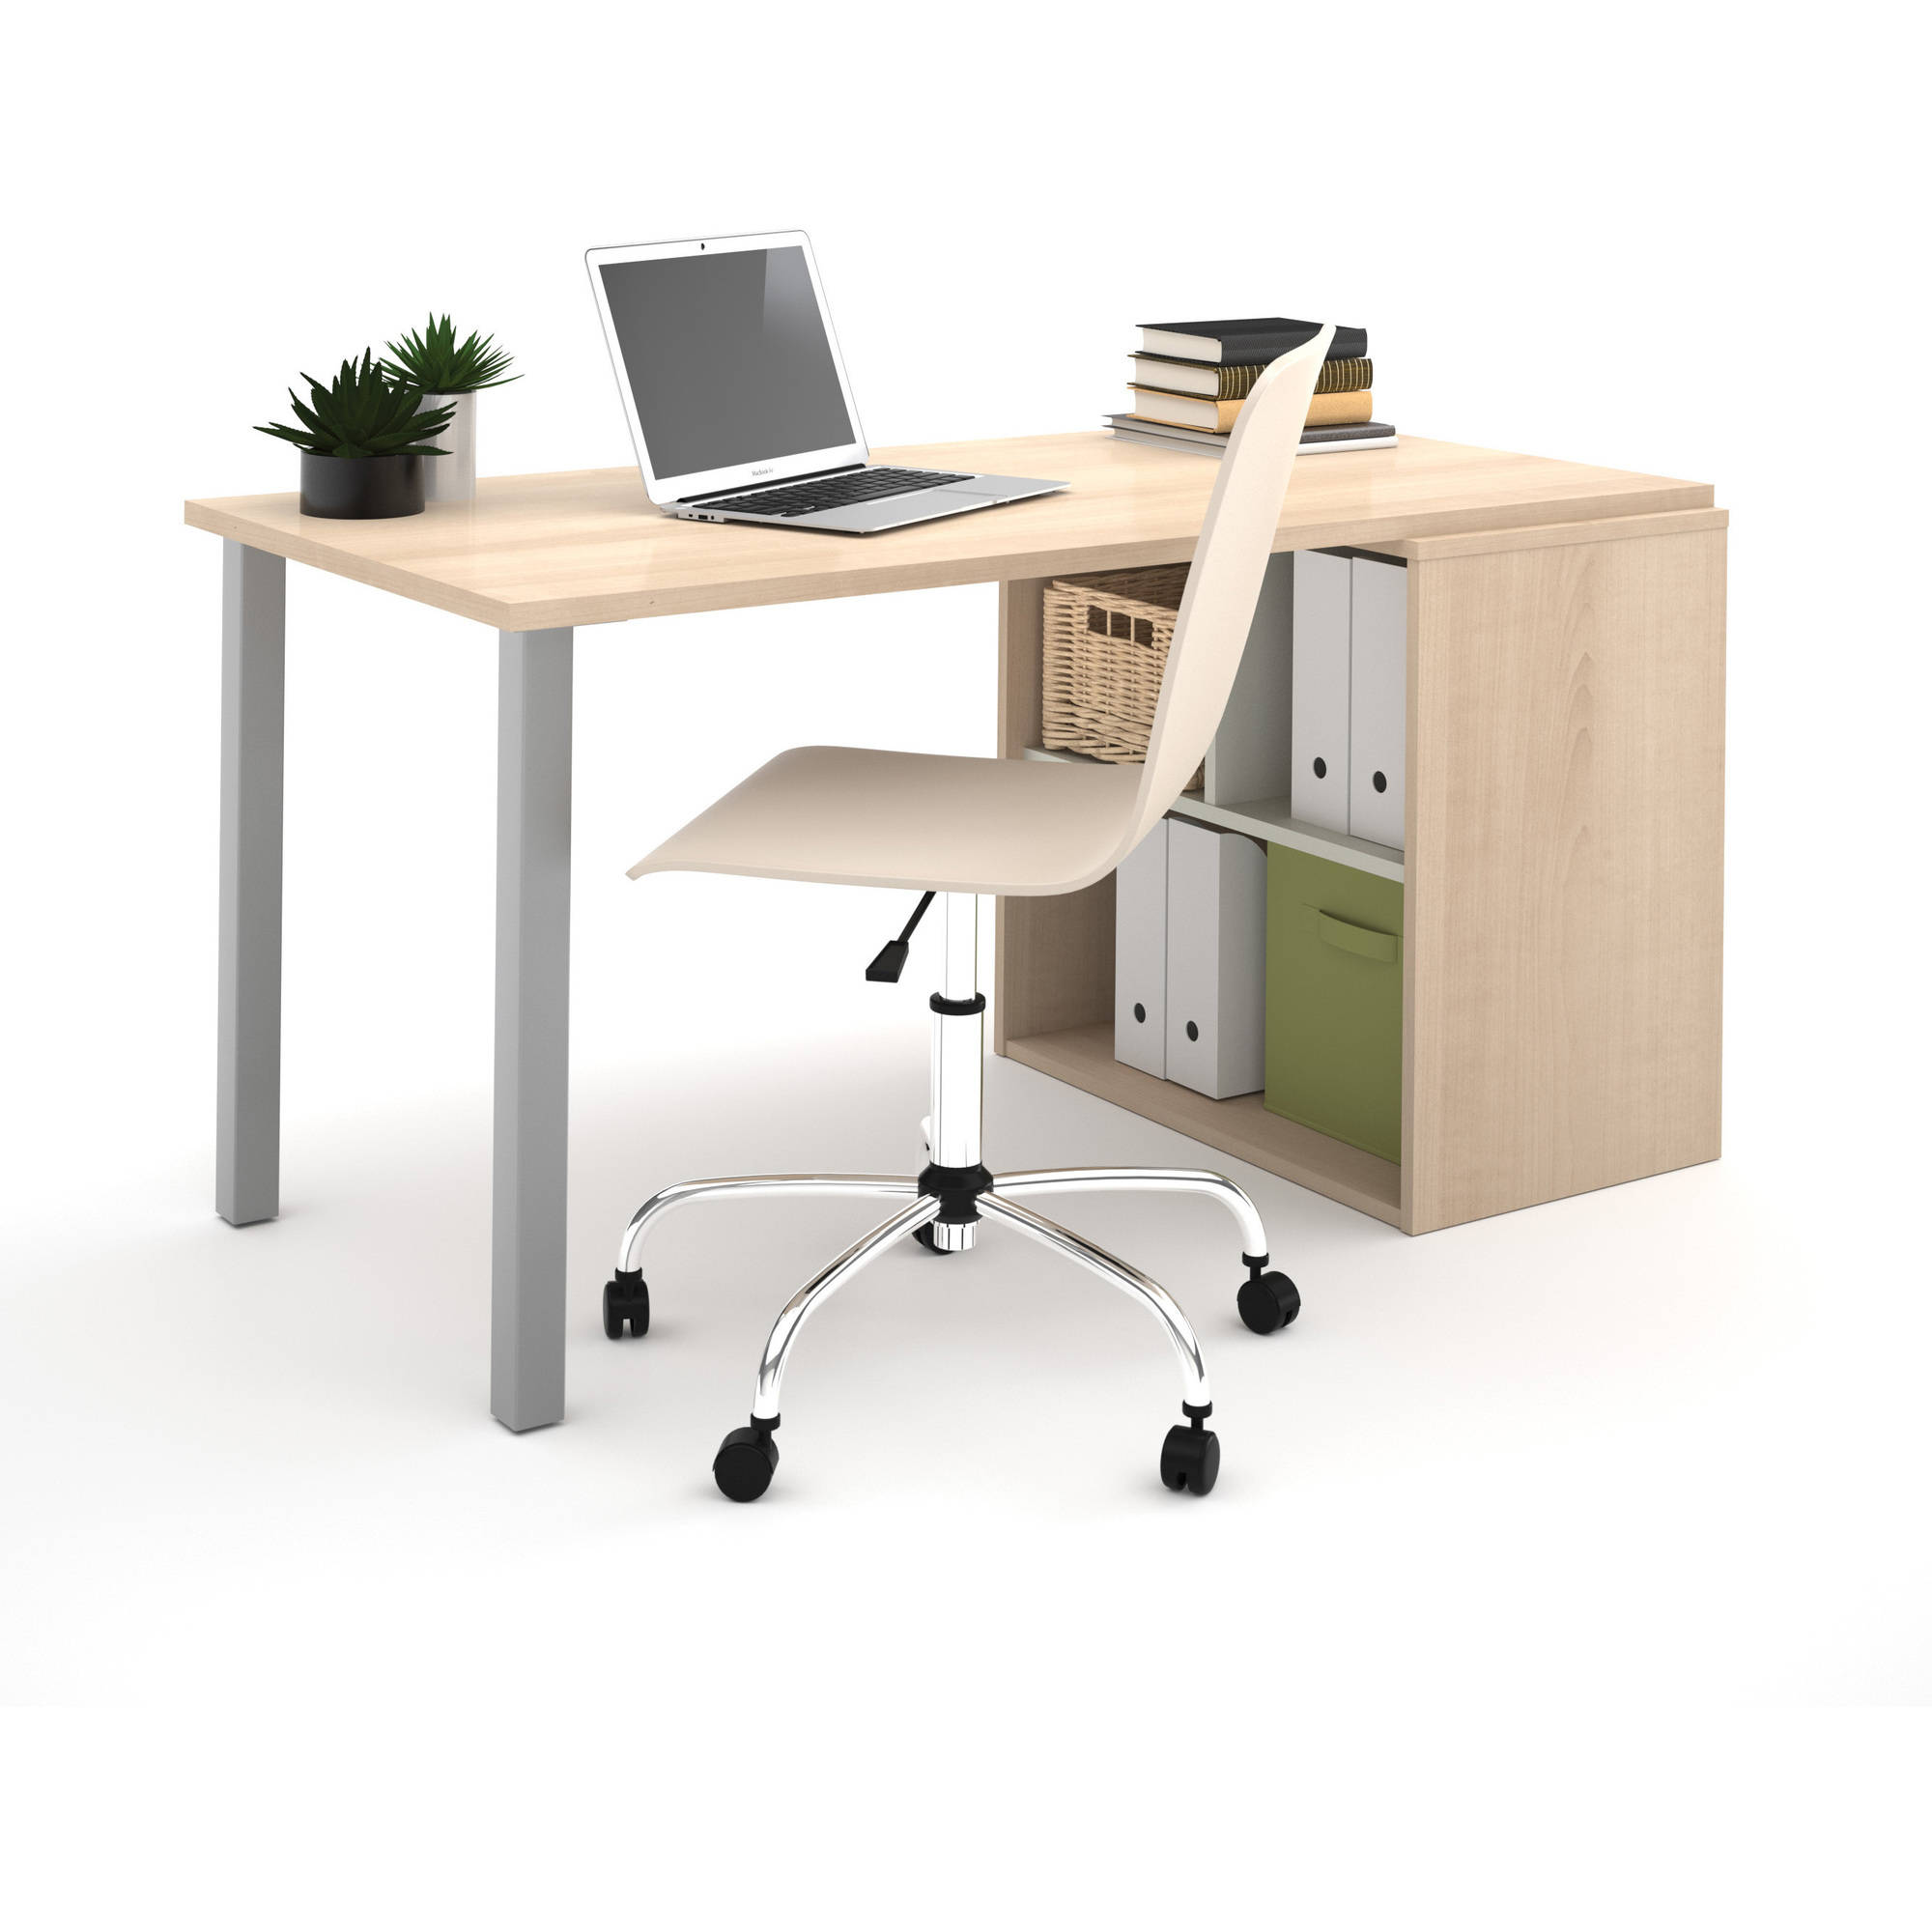 Bestar i3 by Bestar Workstation, Northern Maple and Sandstone